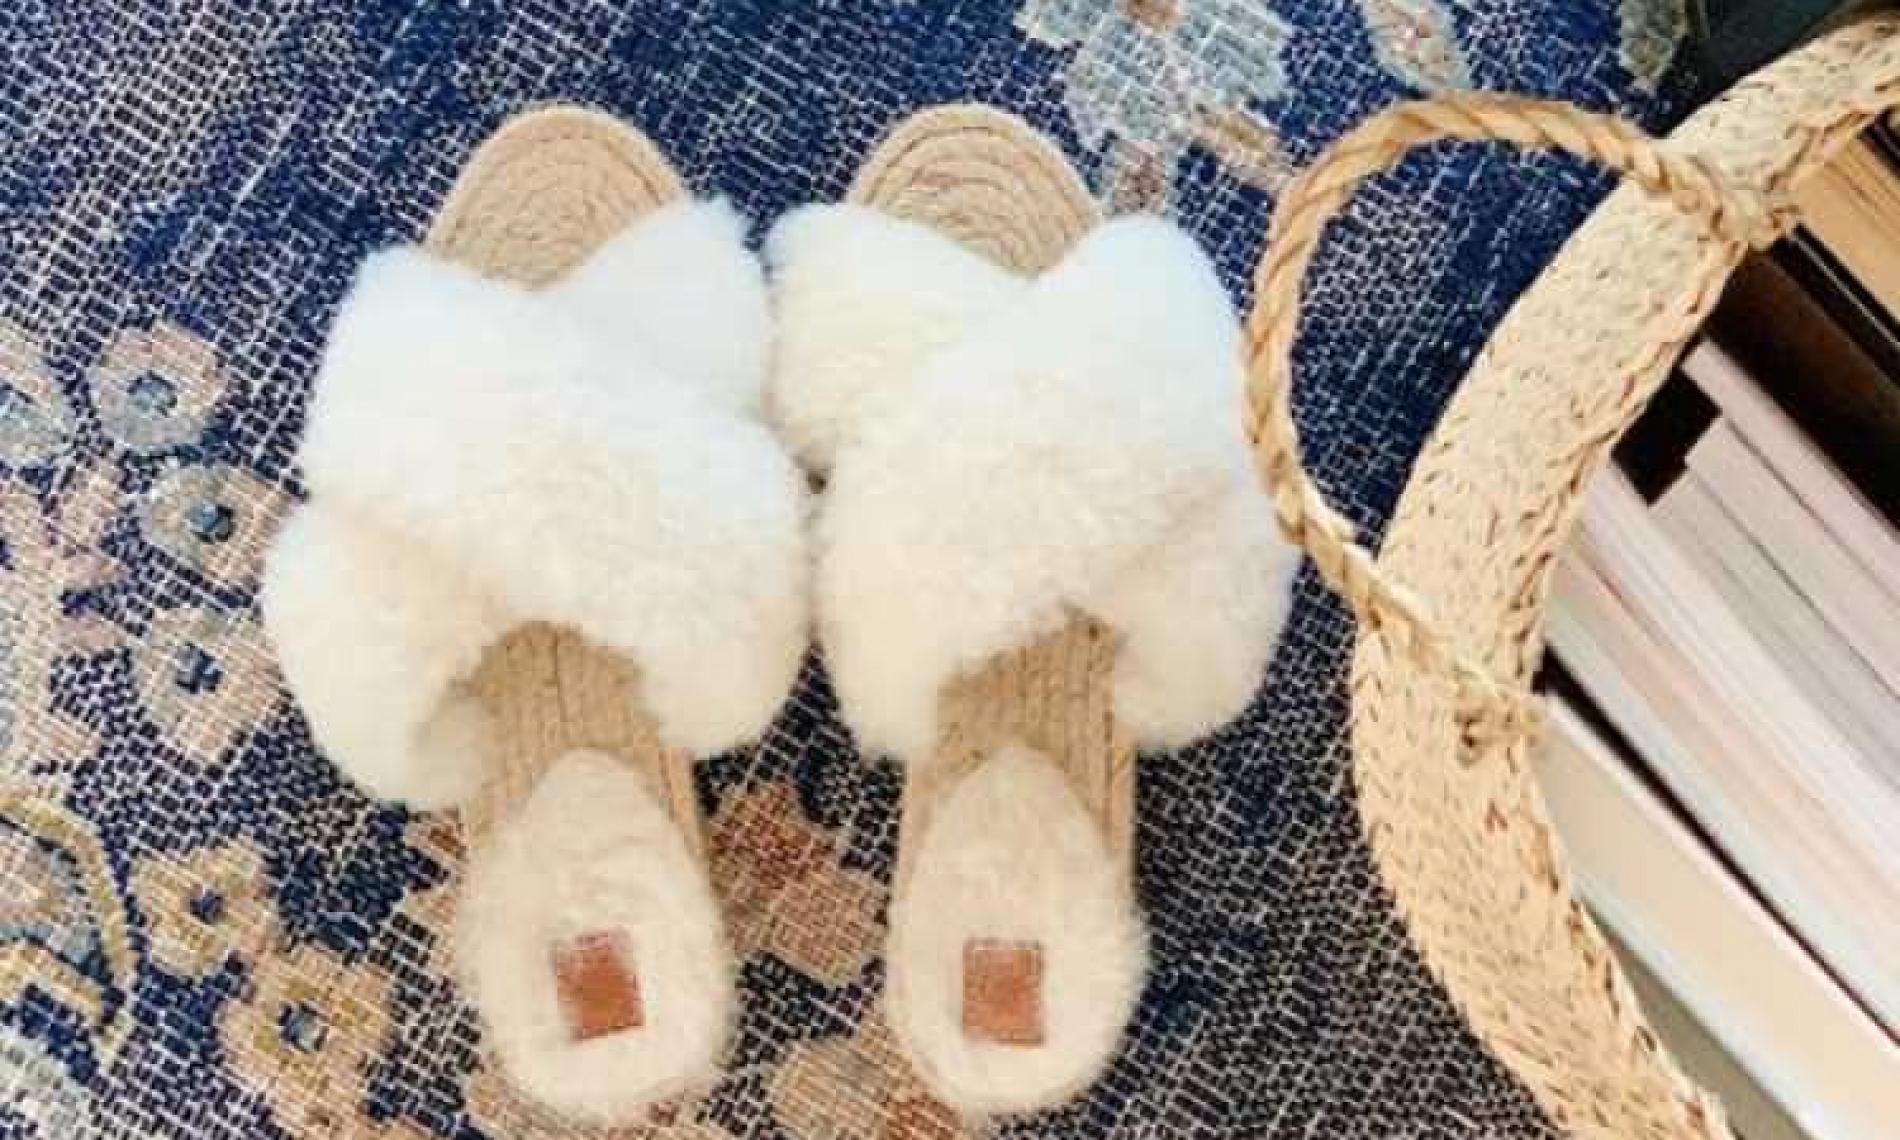 Bosanske zimske papuče od ovčijeg krzna došle do kupaca u SAD-u